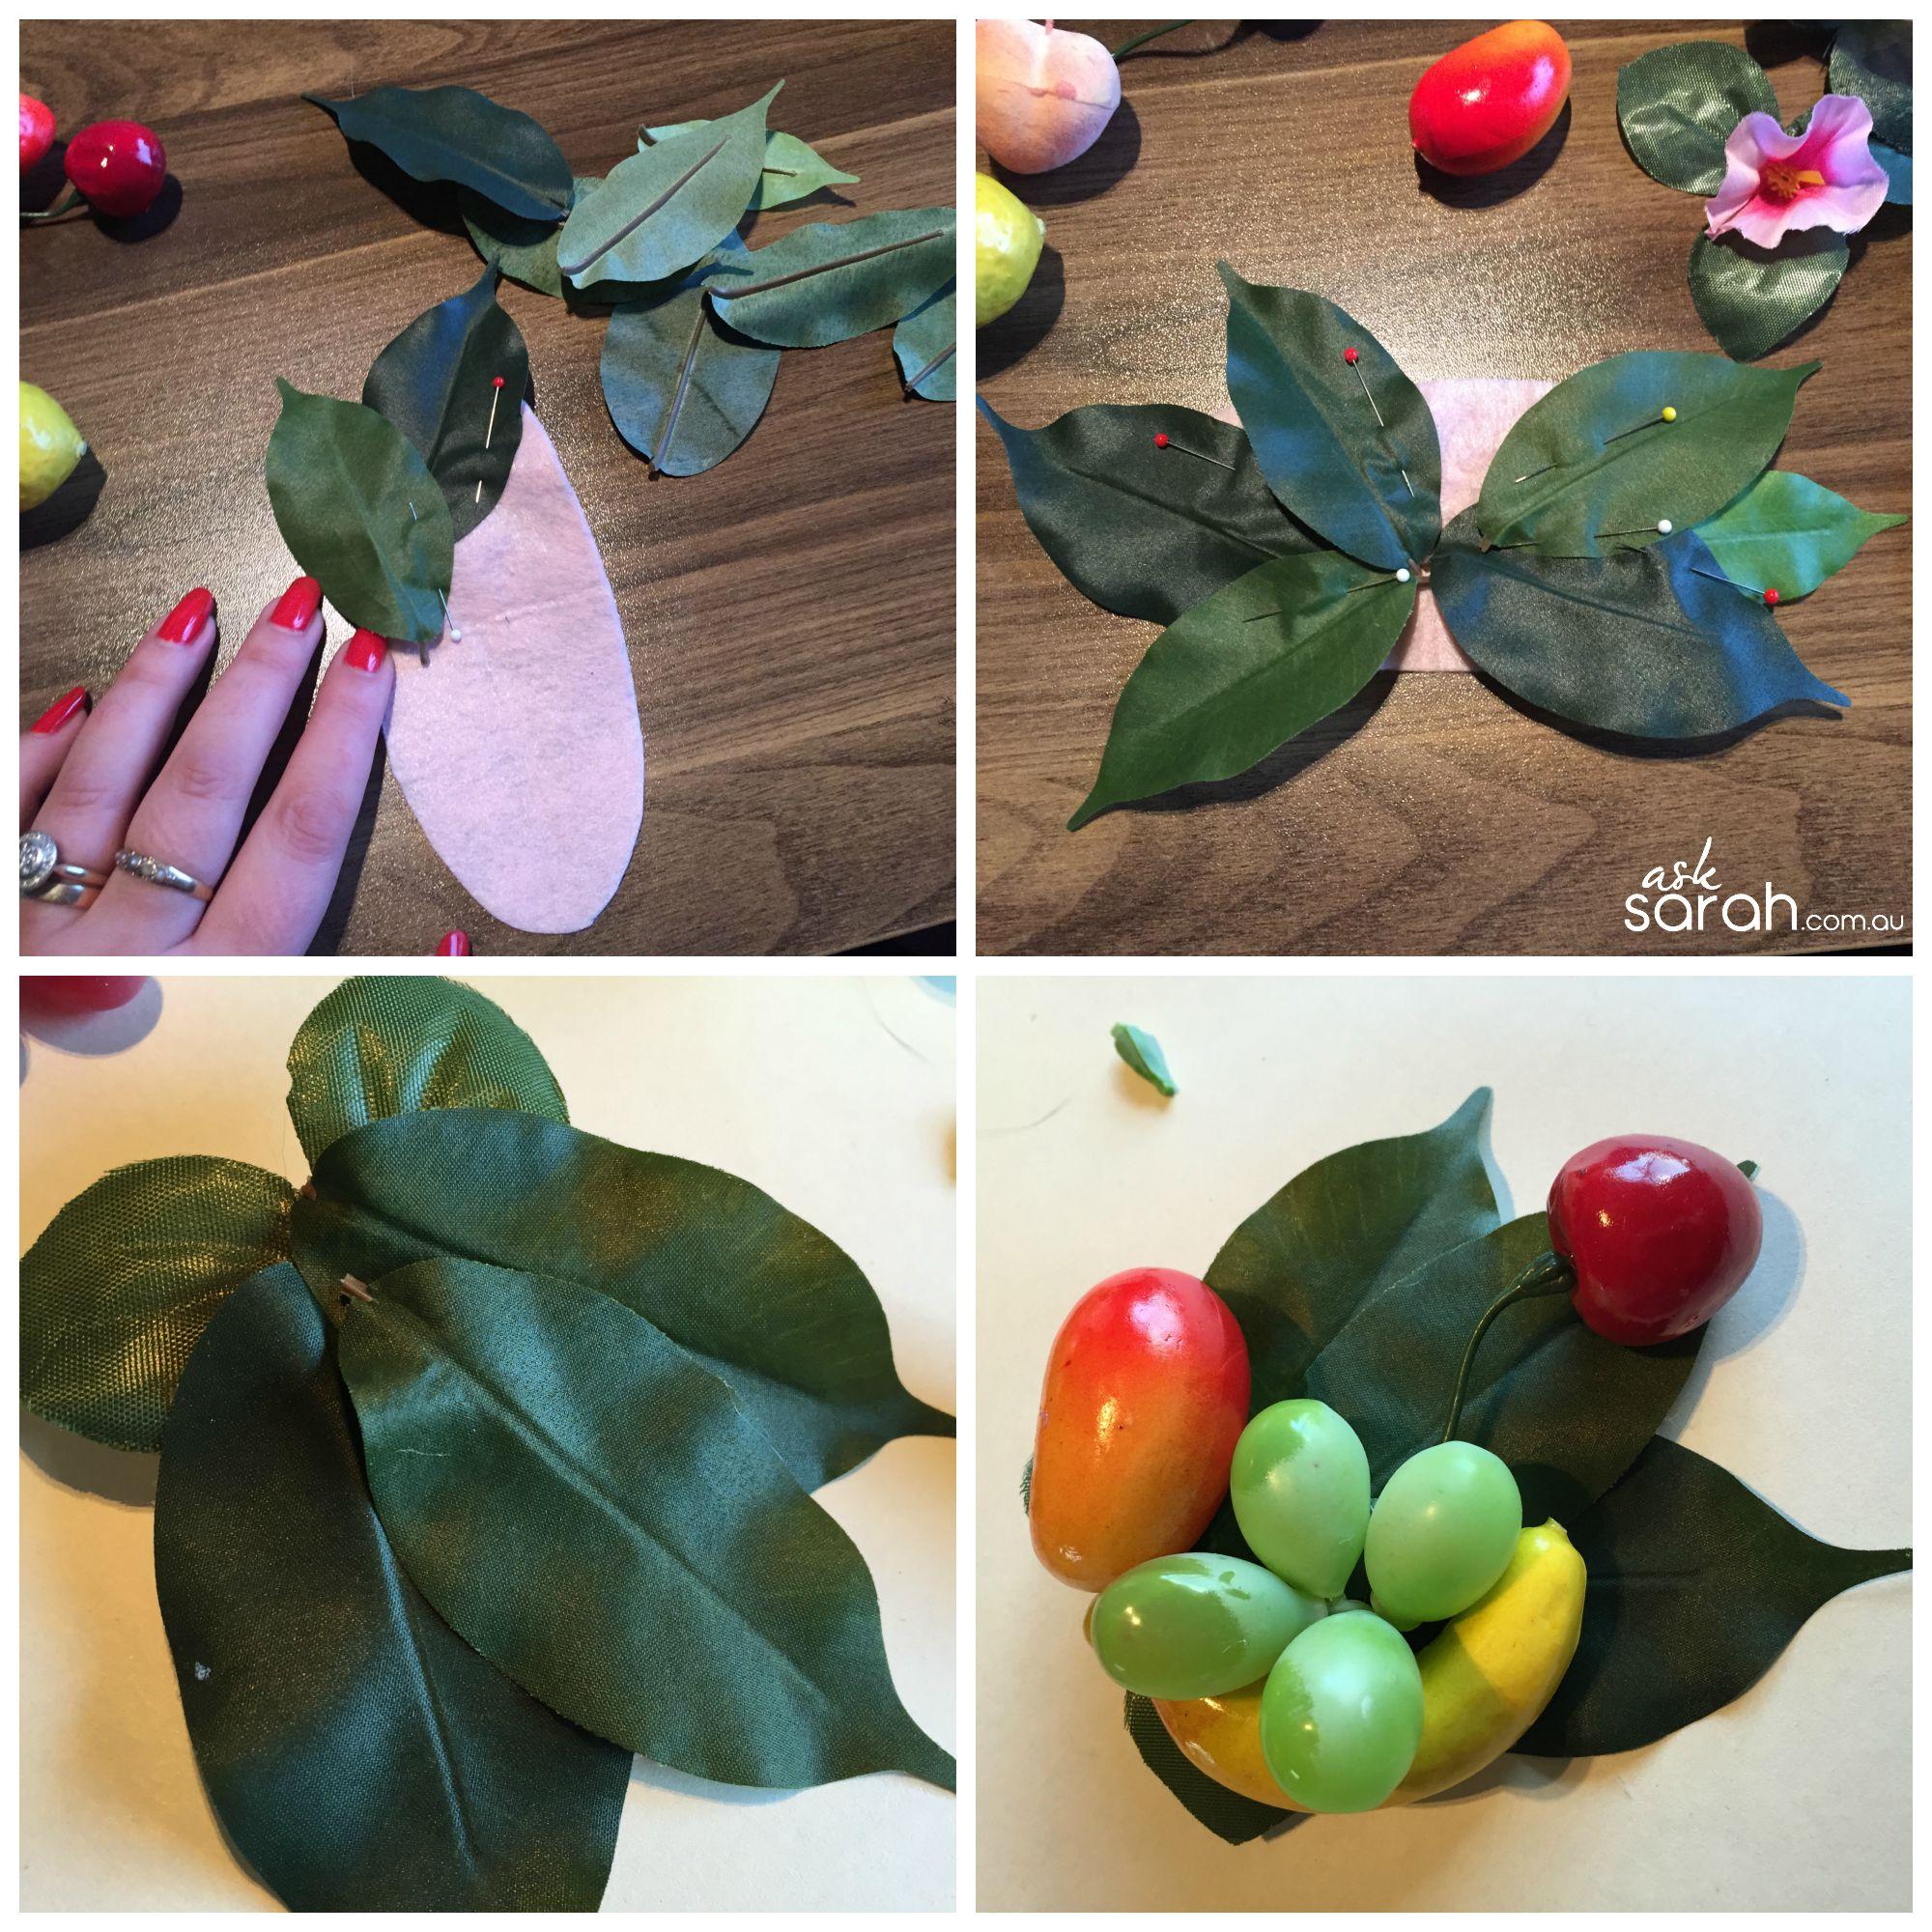 Craft: Carmen Miranda Fruits & Flowers Headband & Hair Pins {DIY Flowers & Fruity Goodness with a Retro/Vintage/Rockabilly Flair!}